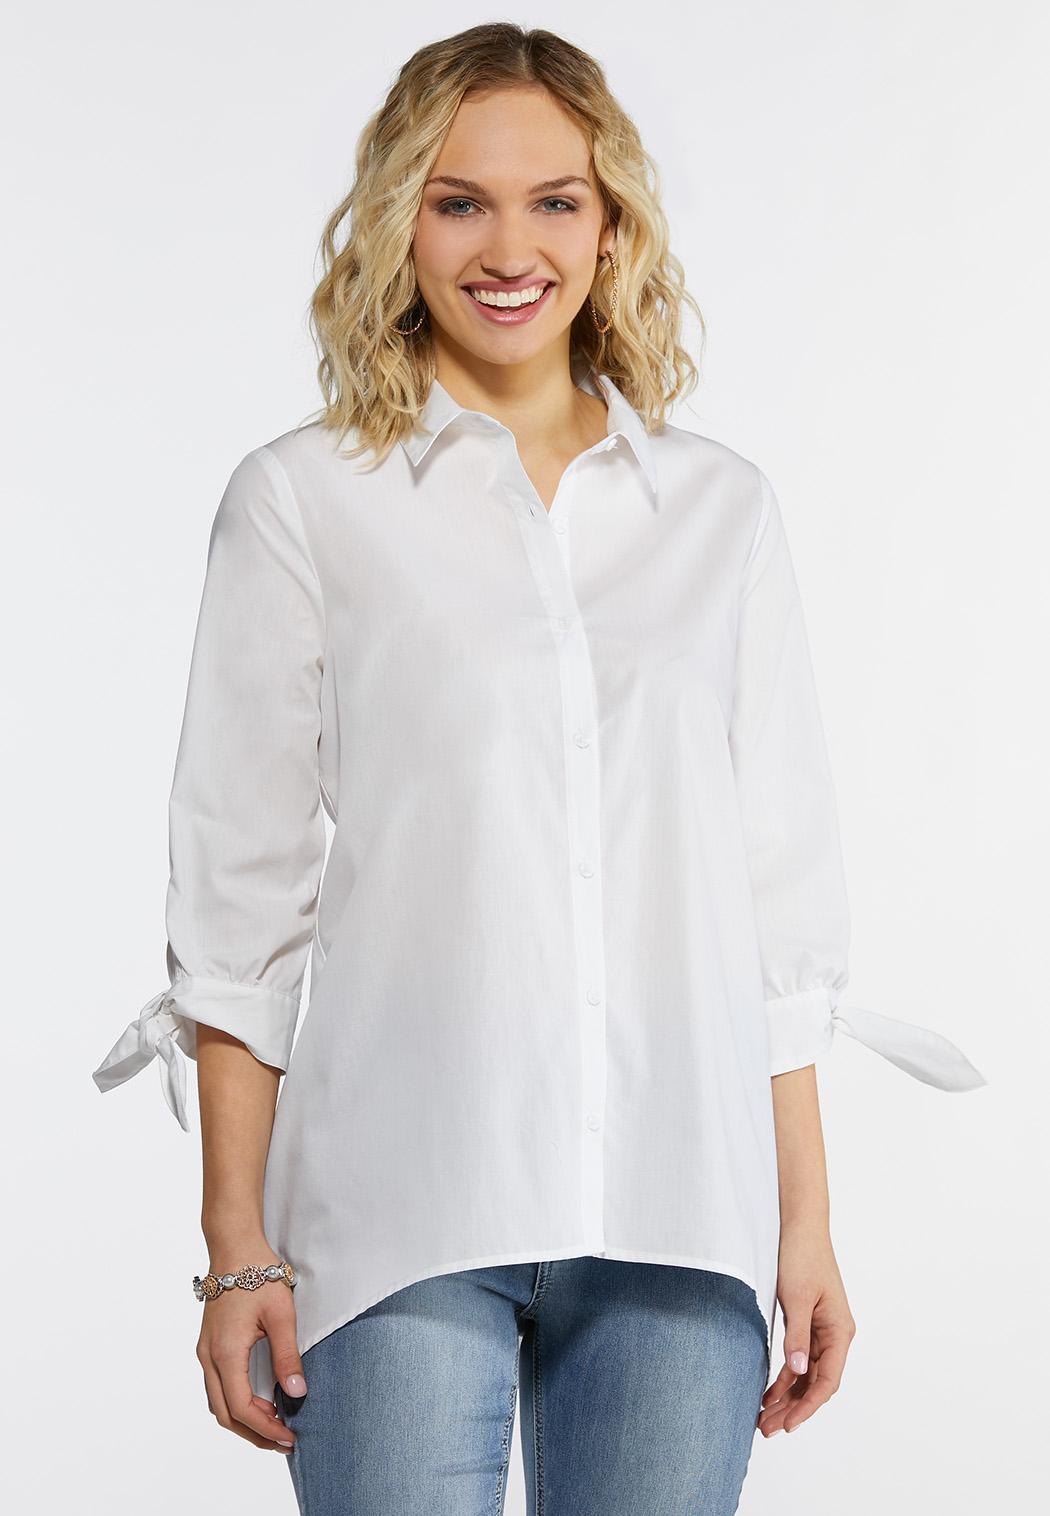 59e1f3722f1b3 Plus Size White Tie Sleeve Tunic Shirts   Blouses Cato Fashions